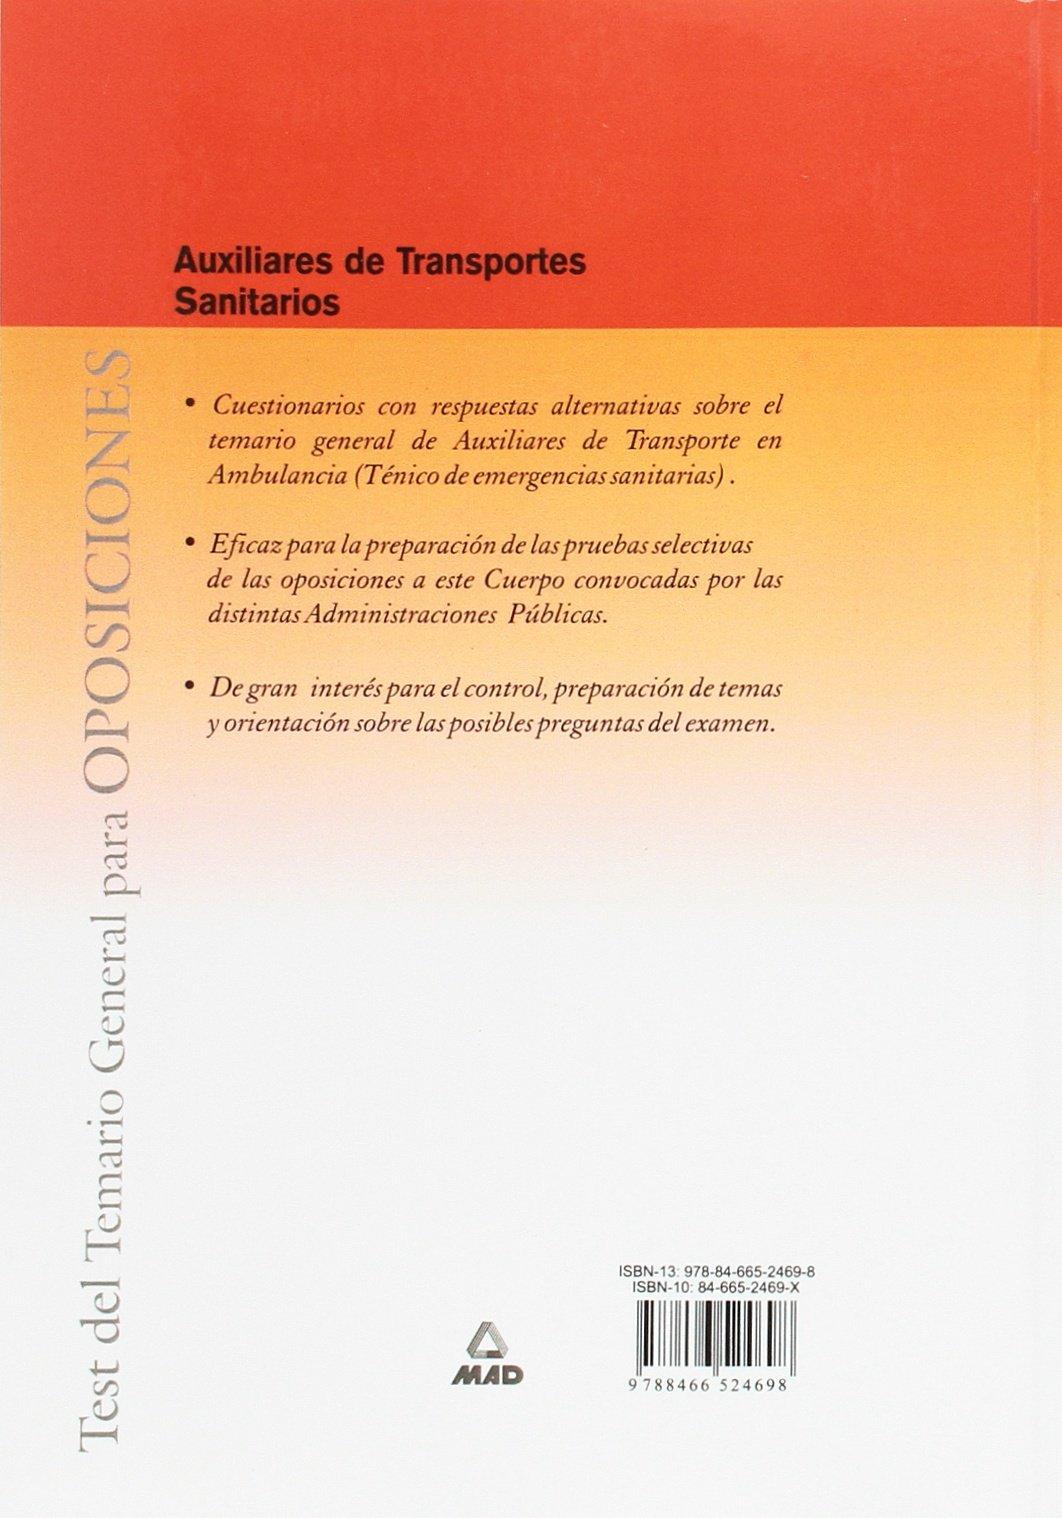 AUXILIARES DE TRANSPORTE SANITARIOS. TEST DEL TEMARIO GENERAL (Spanish Edition)